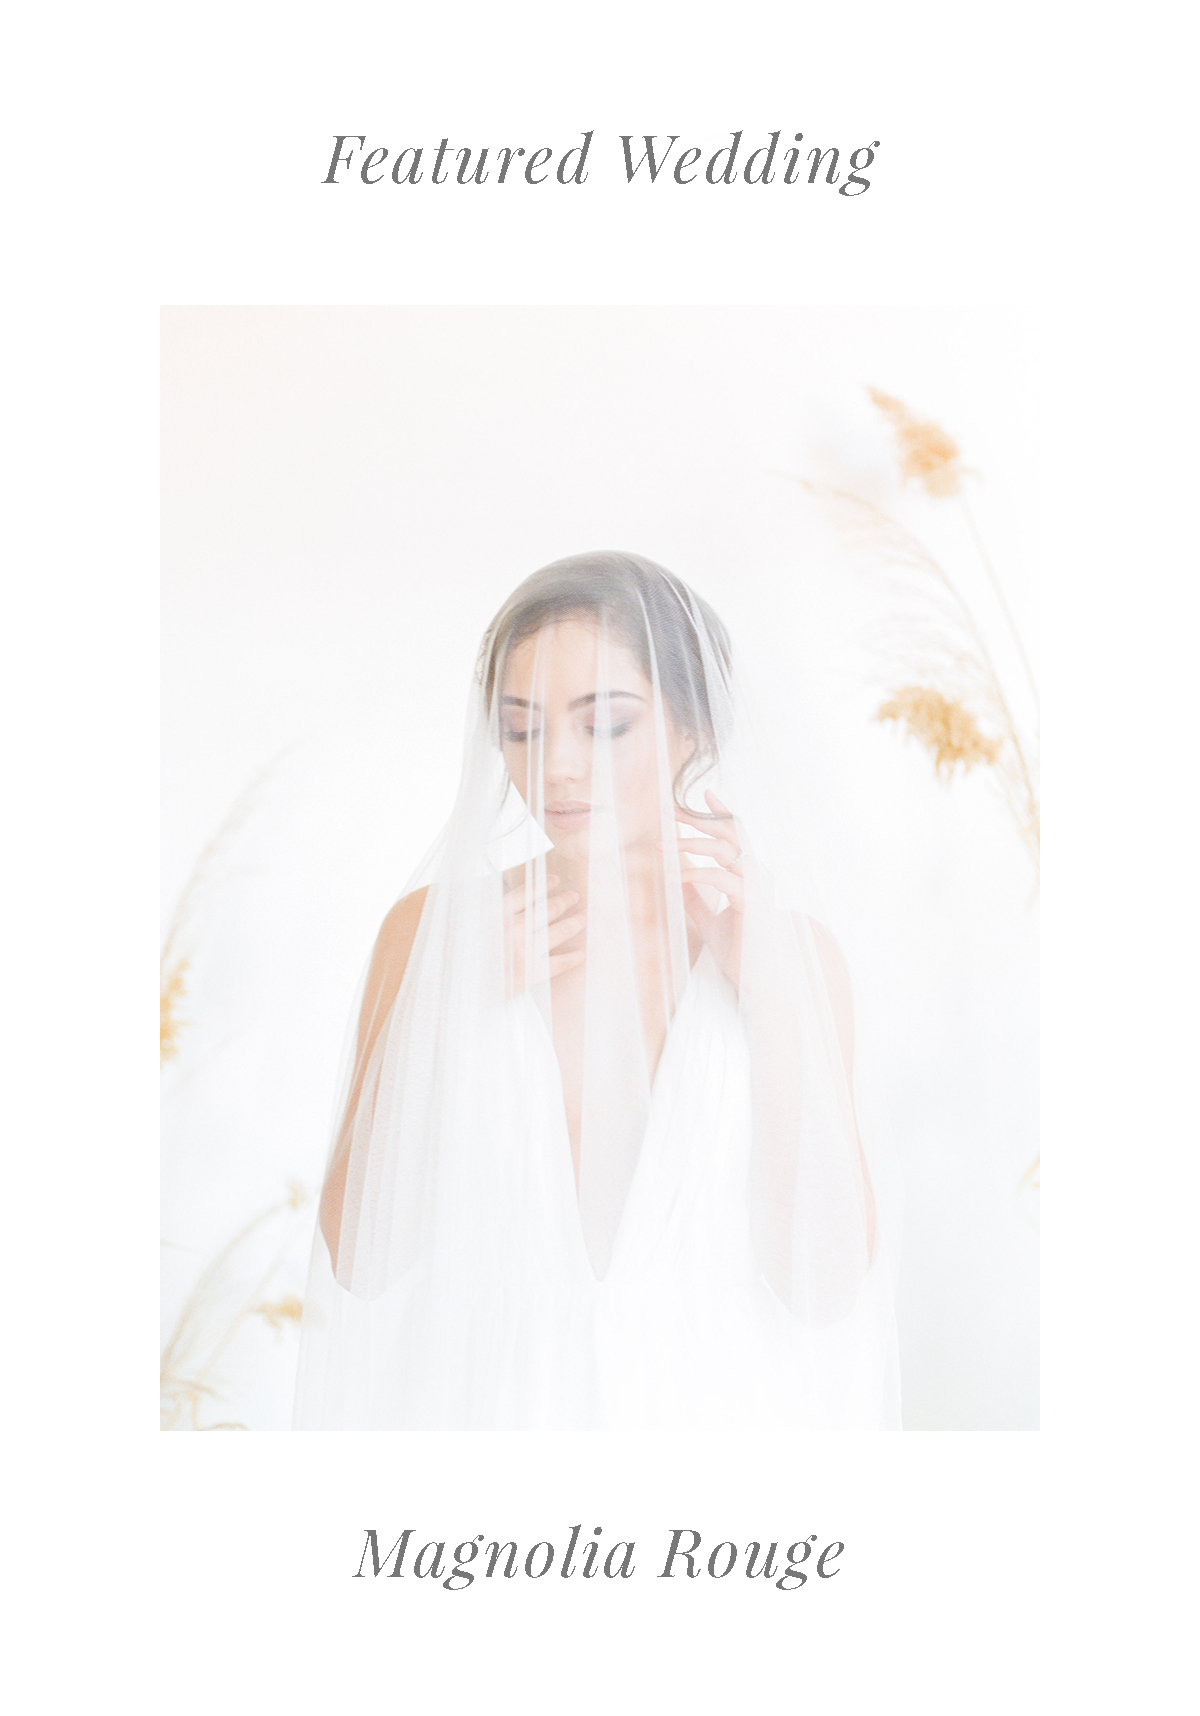 Tiffany Sangster Photography Minimalist Editoral